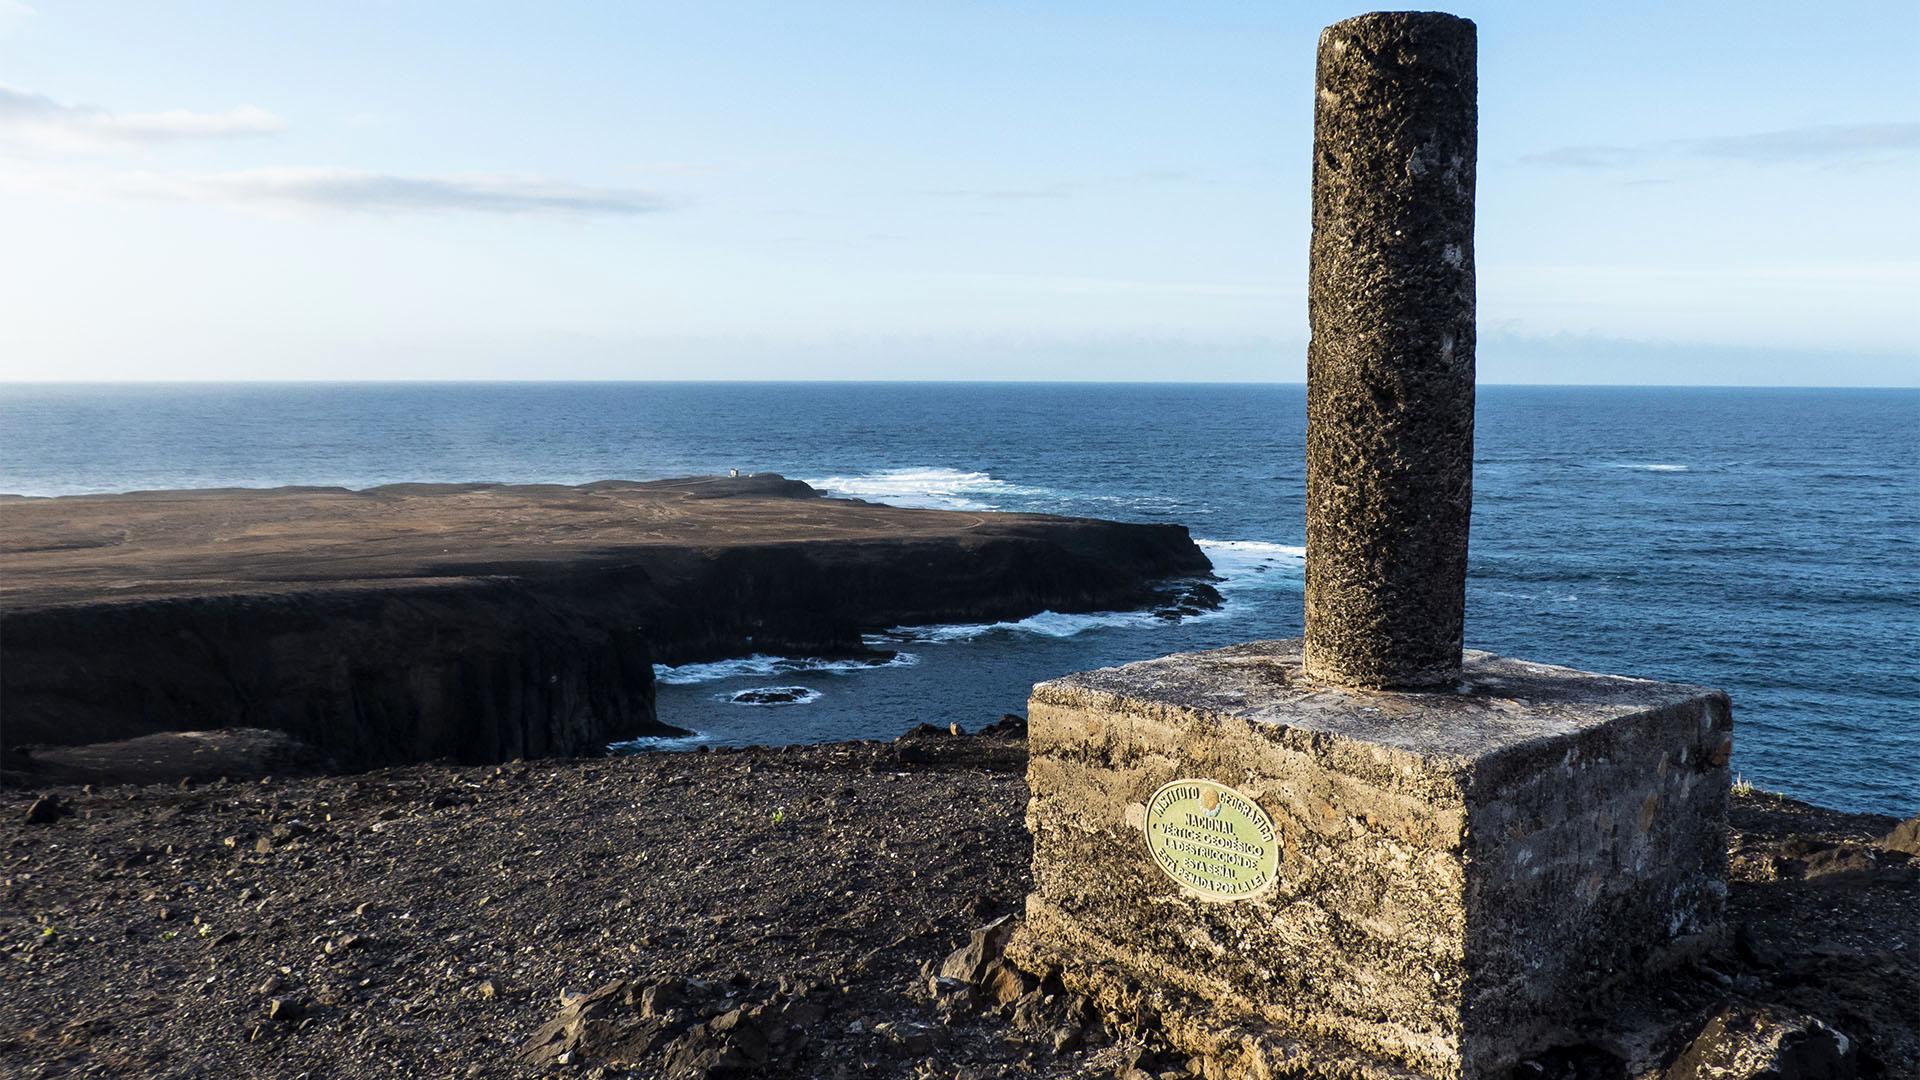 Sehenswürdigkeiten Fuerteventuras: Jandía – Faro de Pesebre